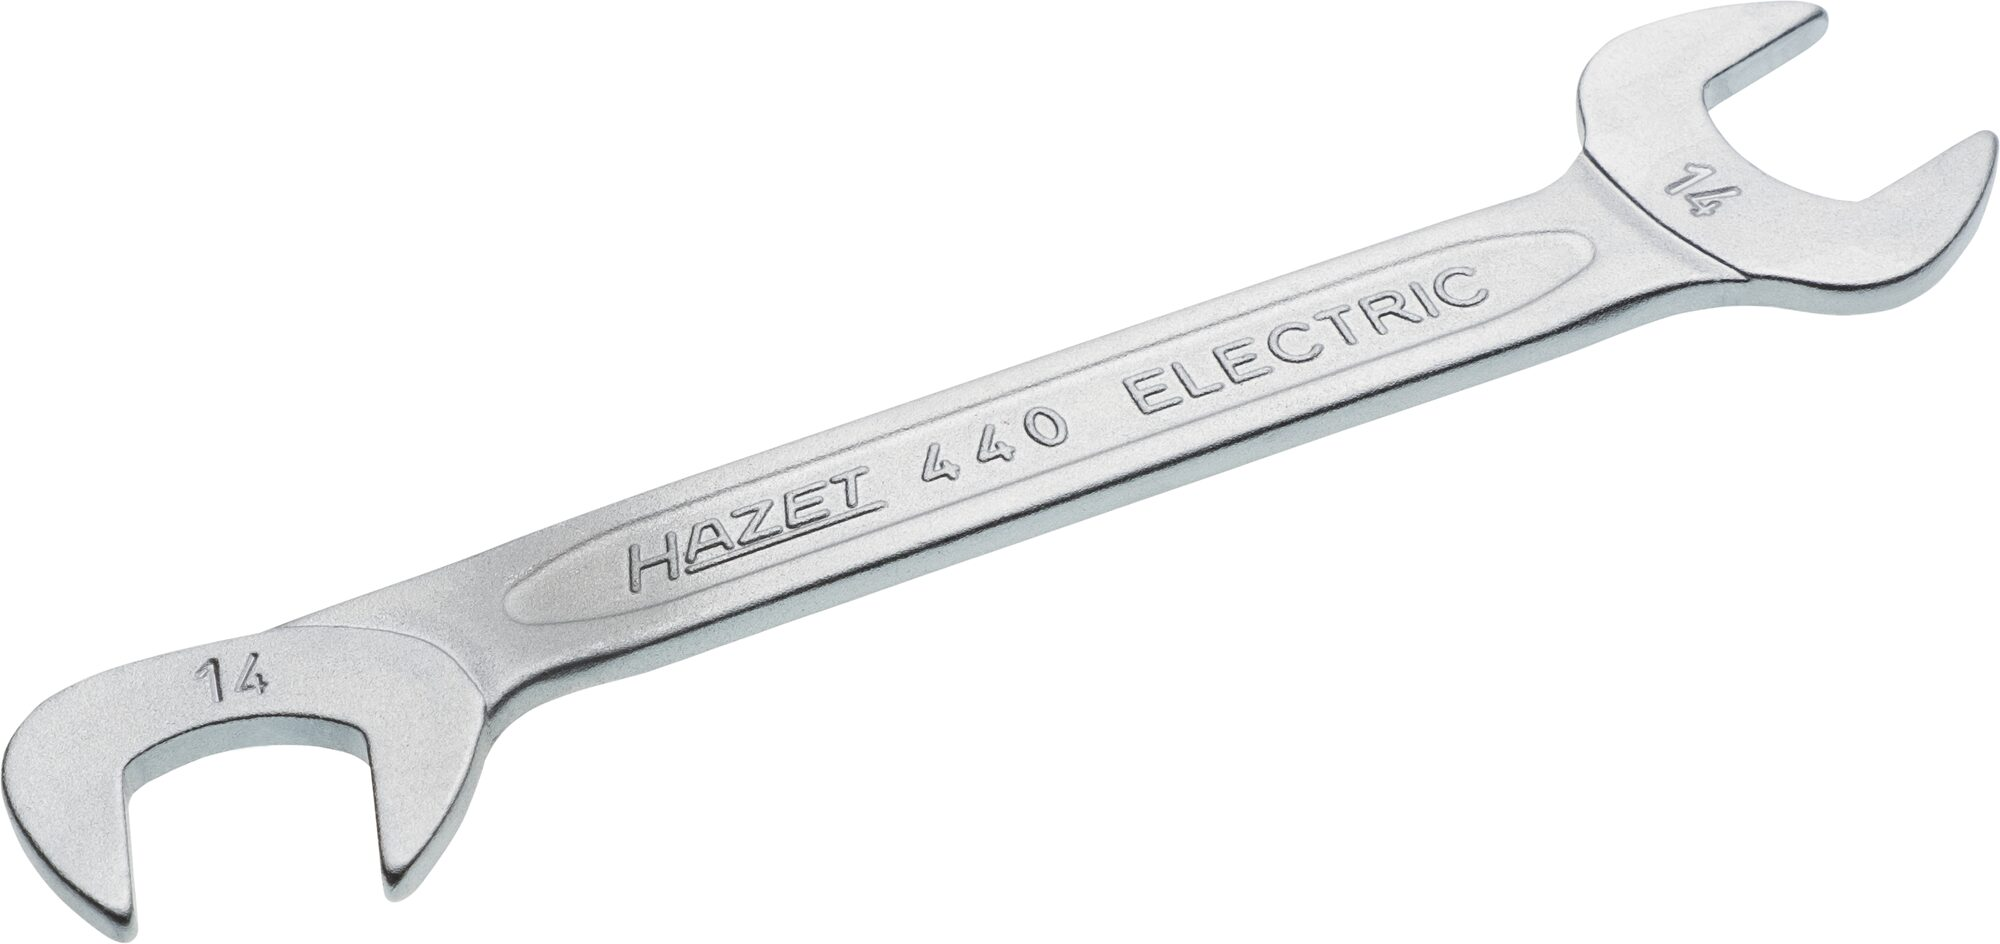 HAZET Doppel-Maulschlüssel 440-14 ∙ Außen-Sechskant Profil ∙ 14 mm